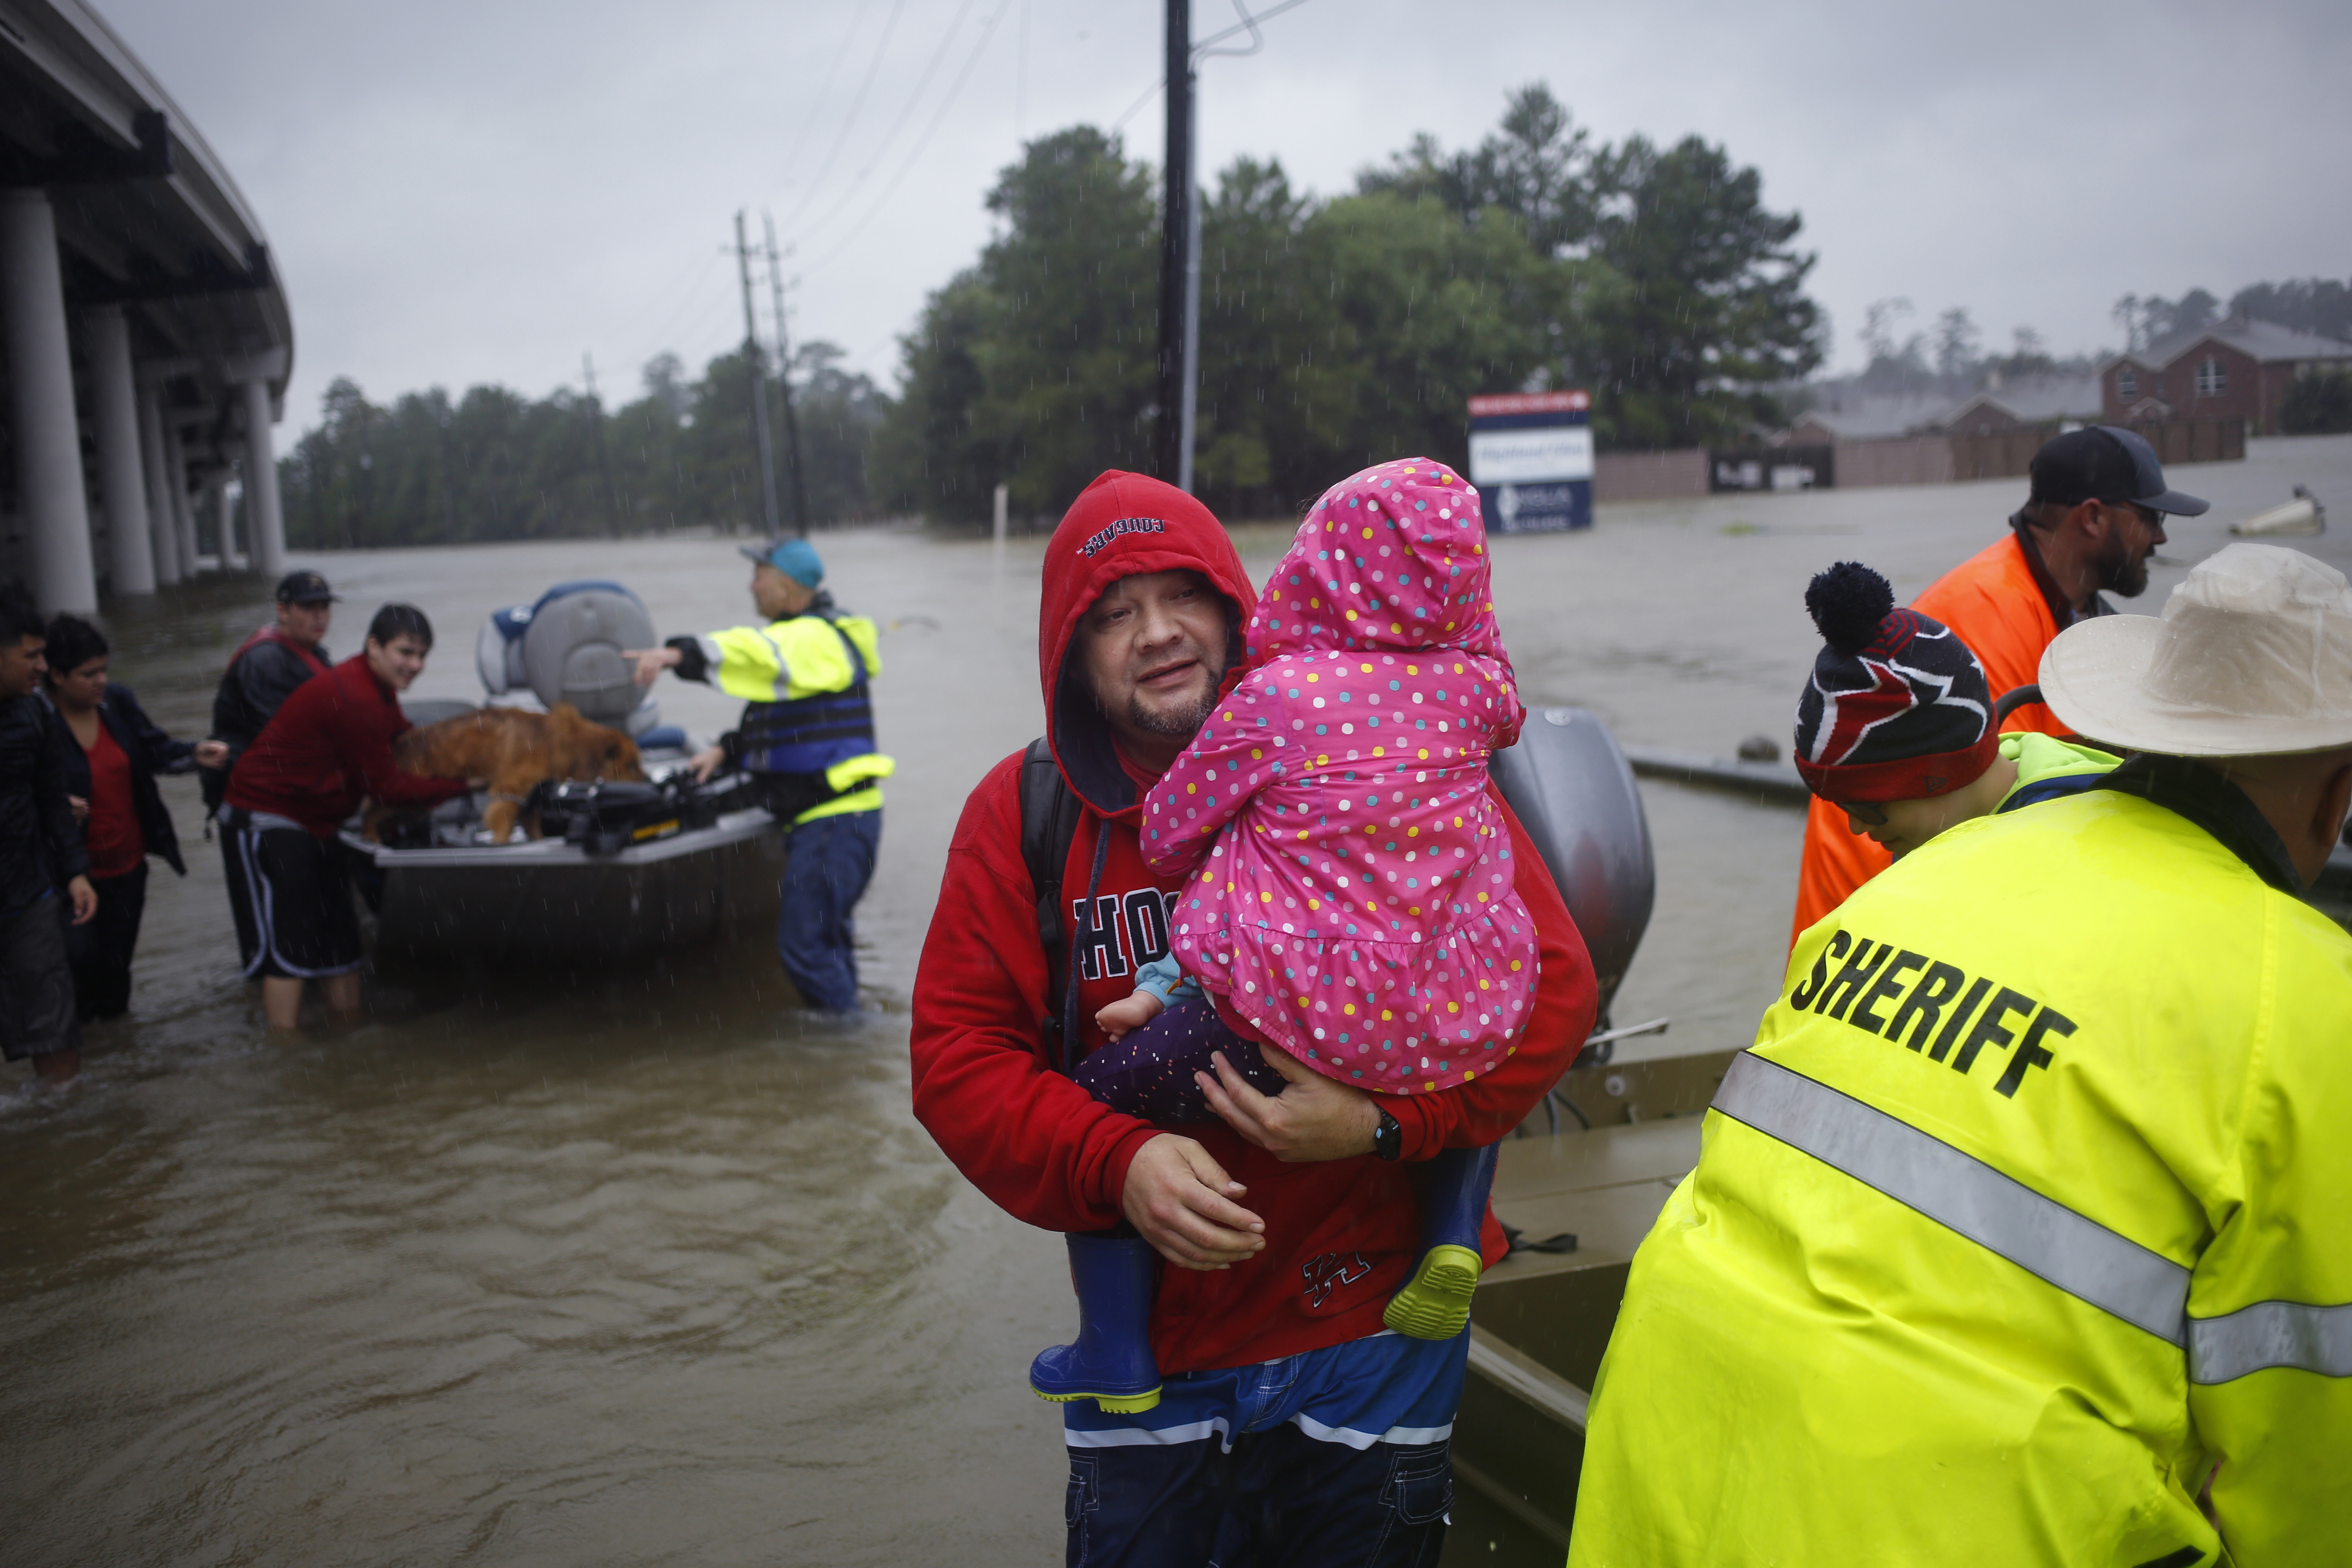 https://assets.sourcemedia.com/17/92/45466edf4b85aa5d429af3babe9f/harvey-flooding-bl-090517.jpg